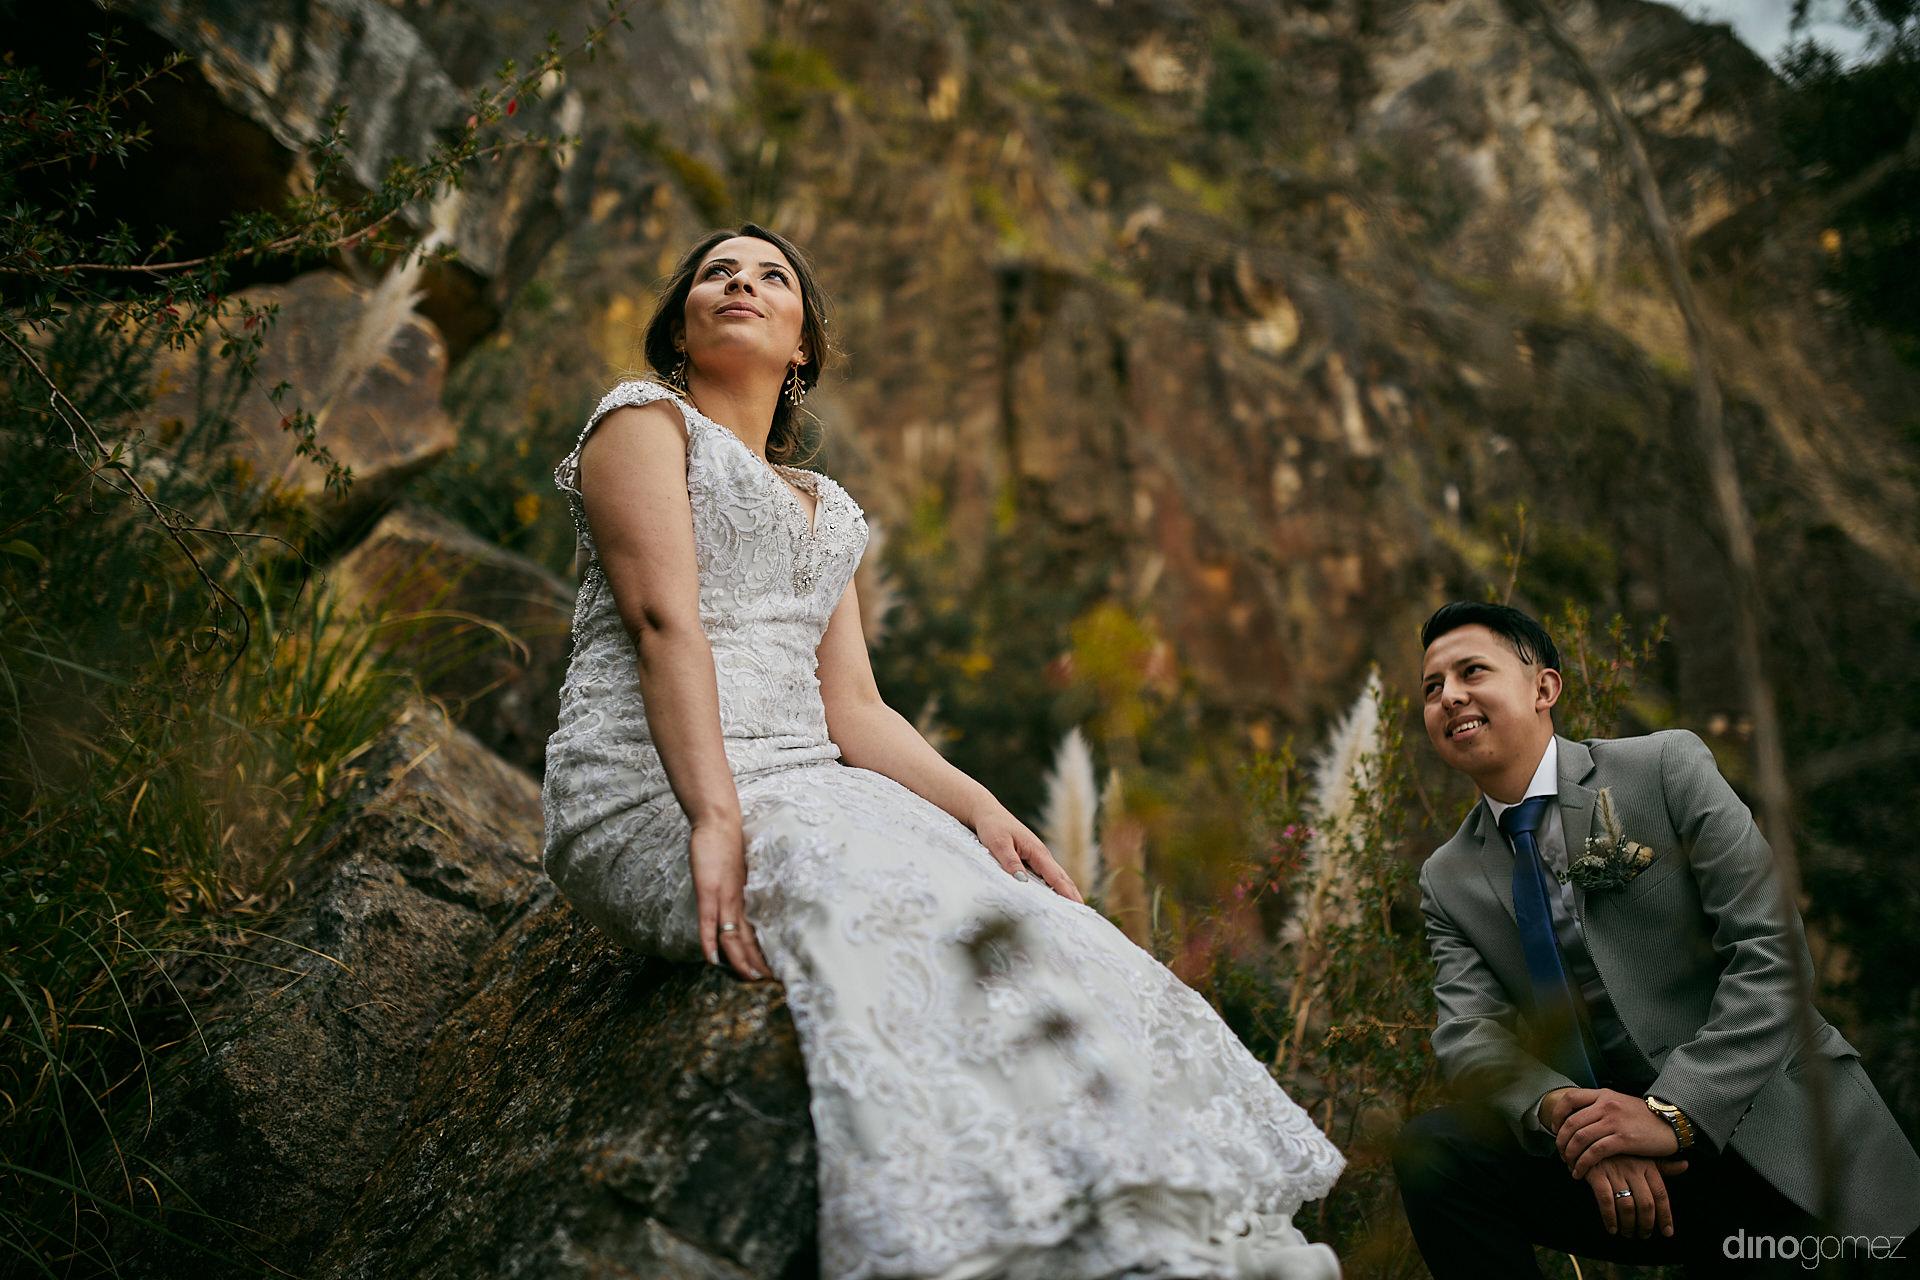 035 - Diy Budget Destination Weddings Can Be Prety Too!